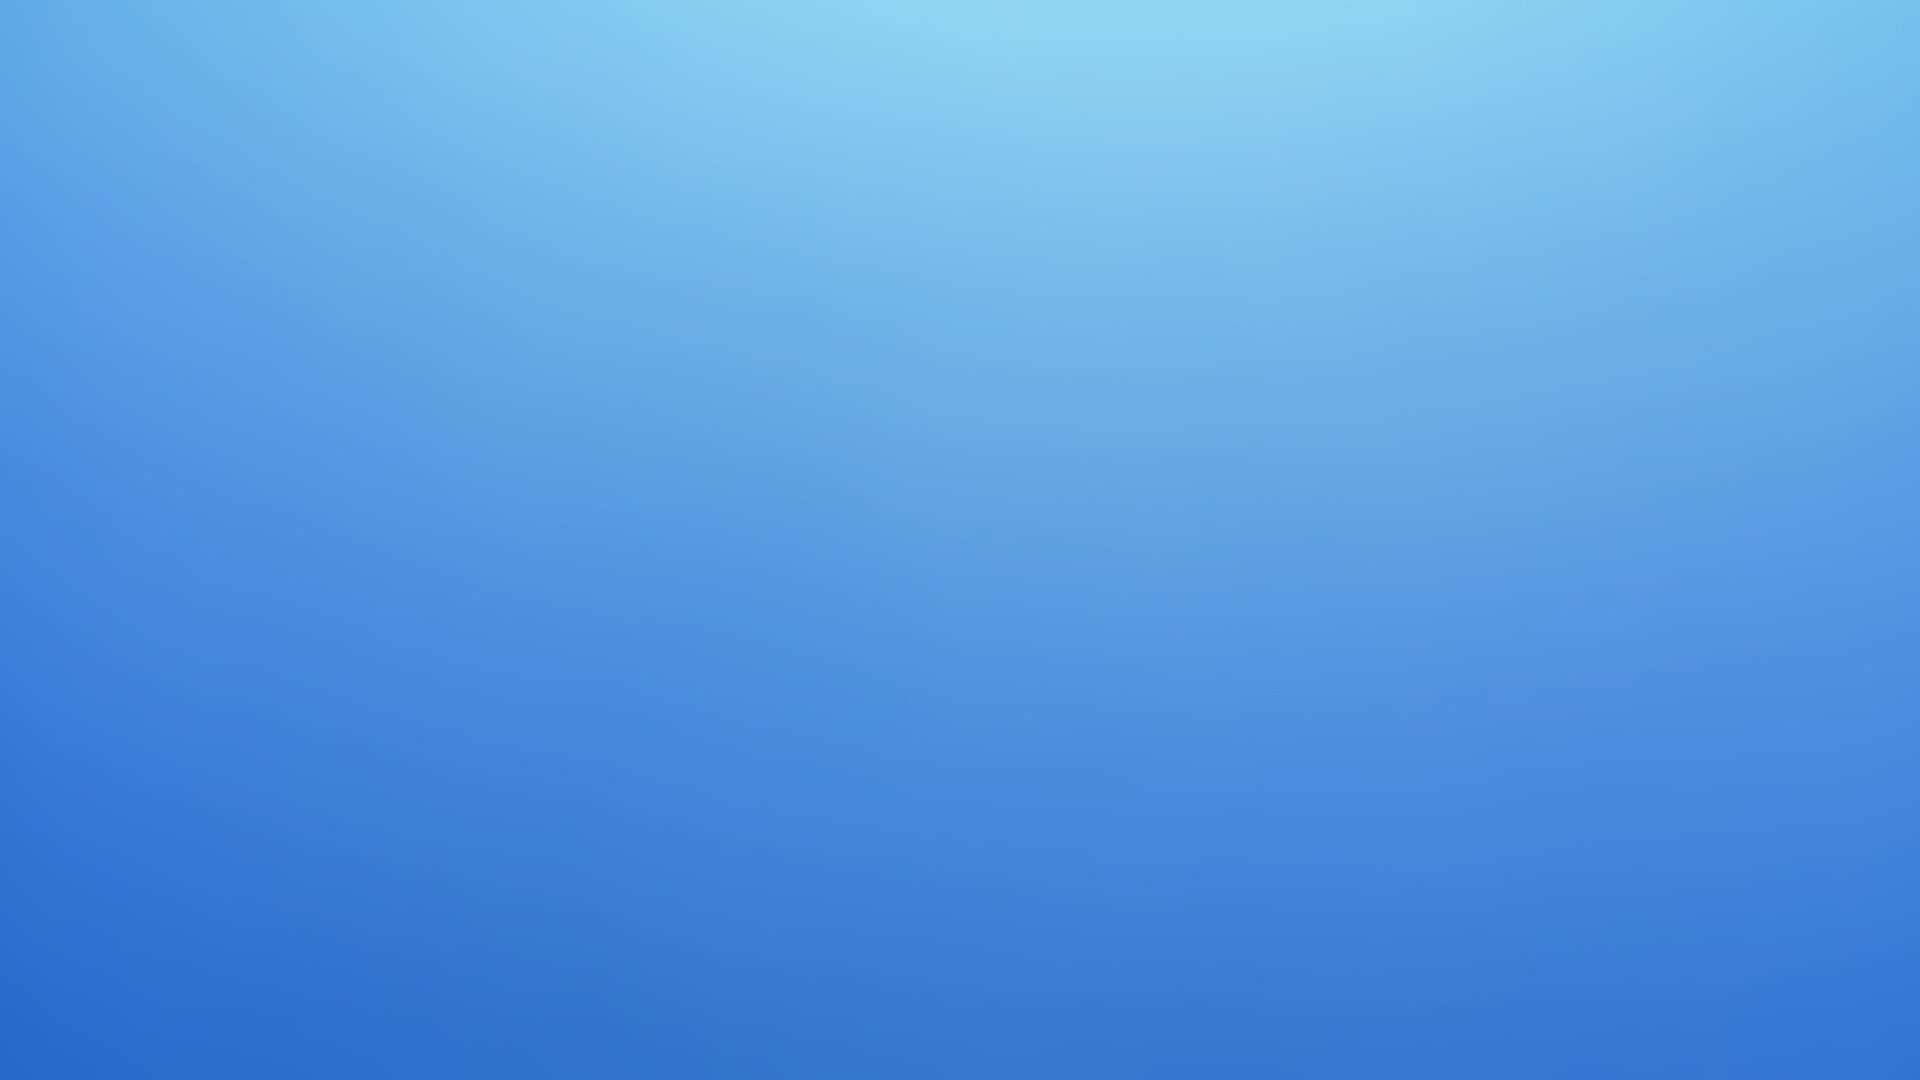 Plain Blue Screen Wallpaper 1920x1080 Wallpapertag